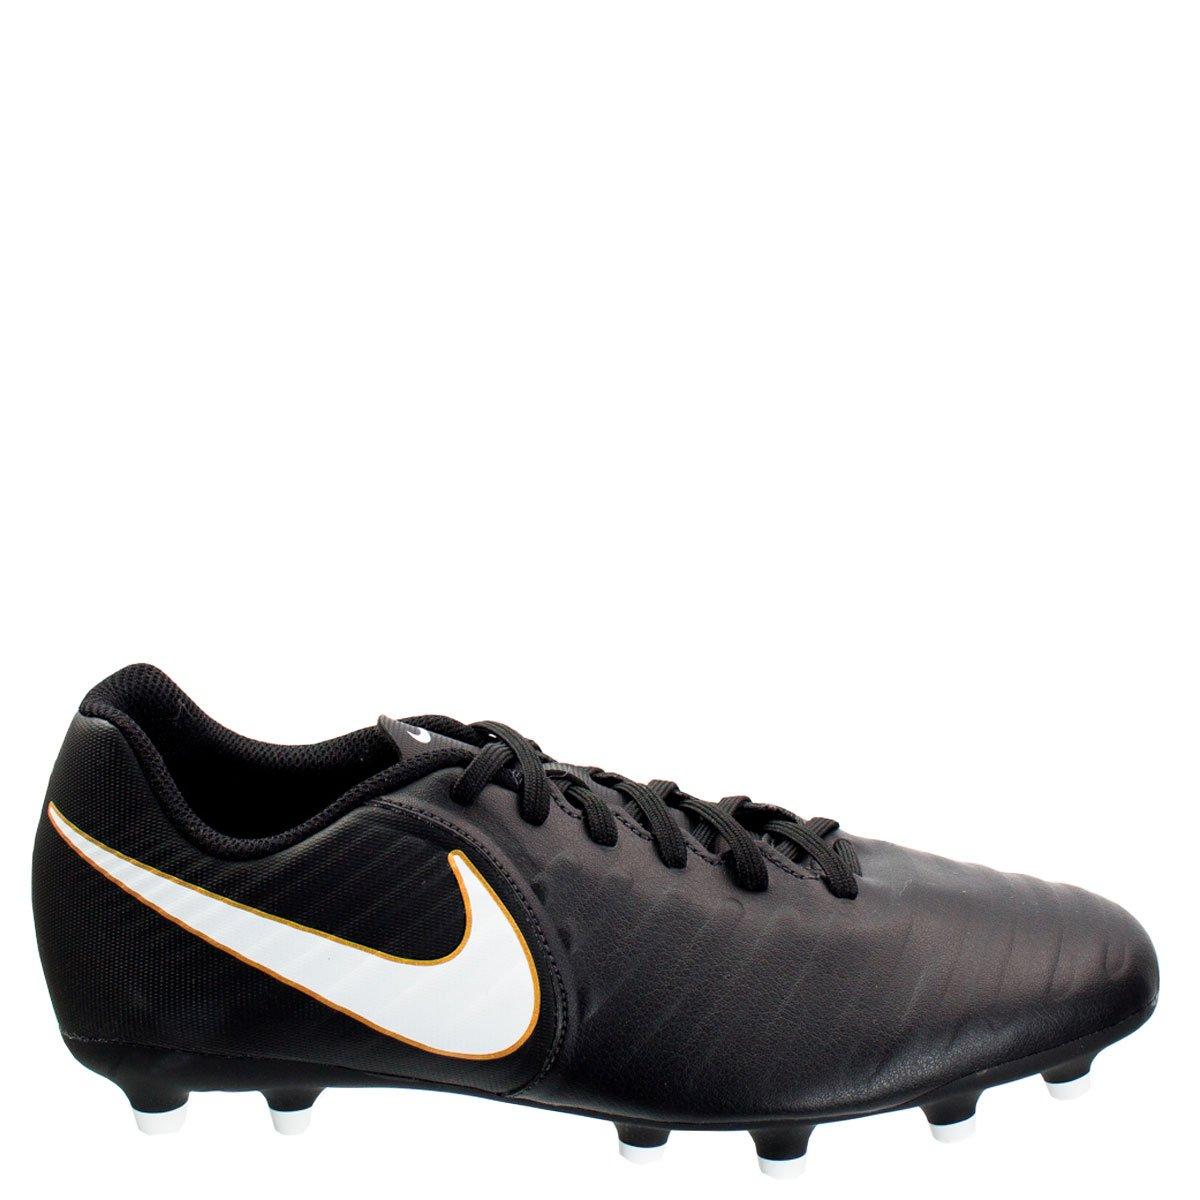 44932370d1 Bizz Store - Chuteira Campo Nike Tiempo Rio IV FG Preta